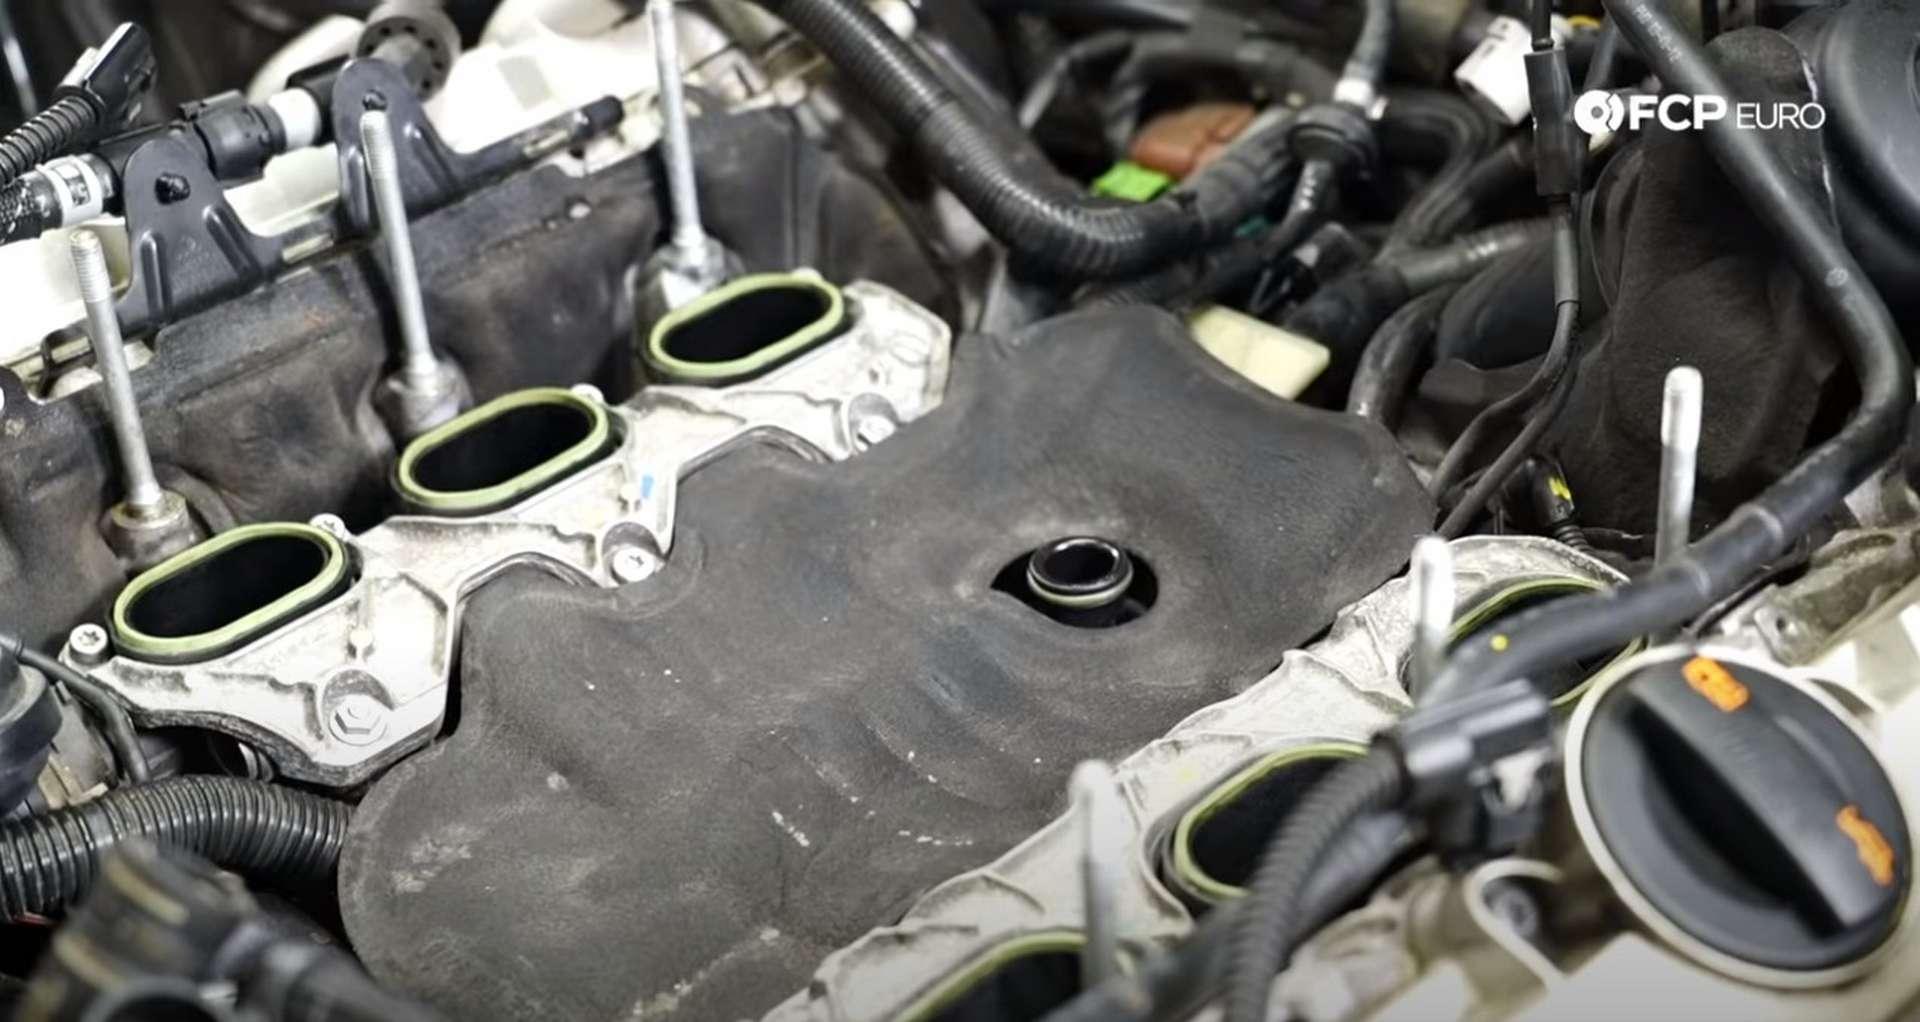 DIY Audi 3.0t Walnut Blasting Intake Valves installing the engine valley cover